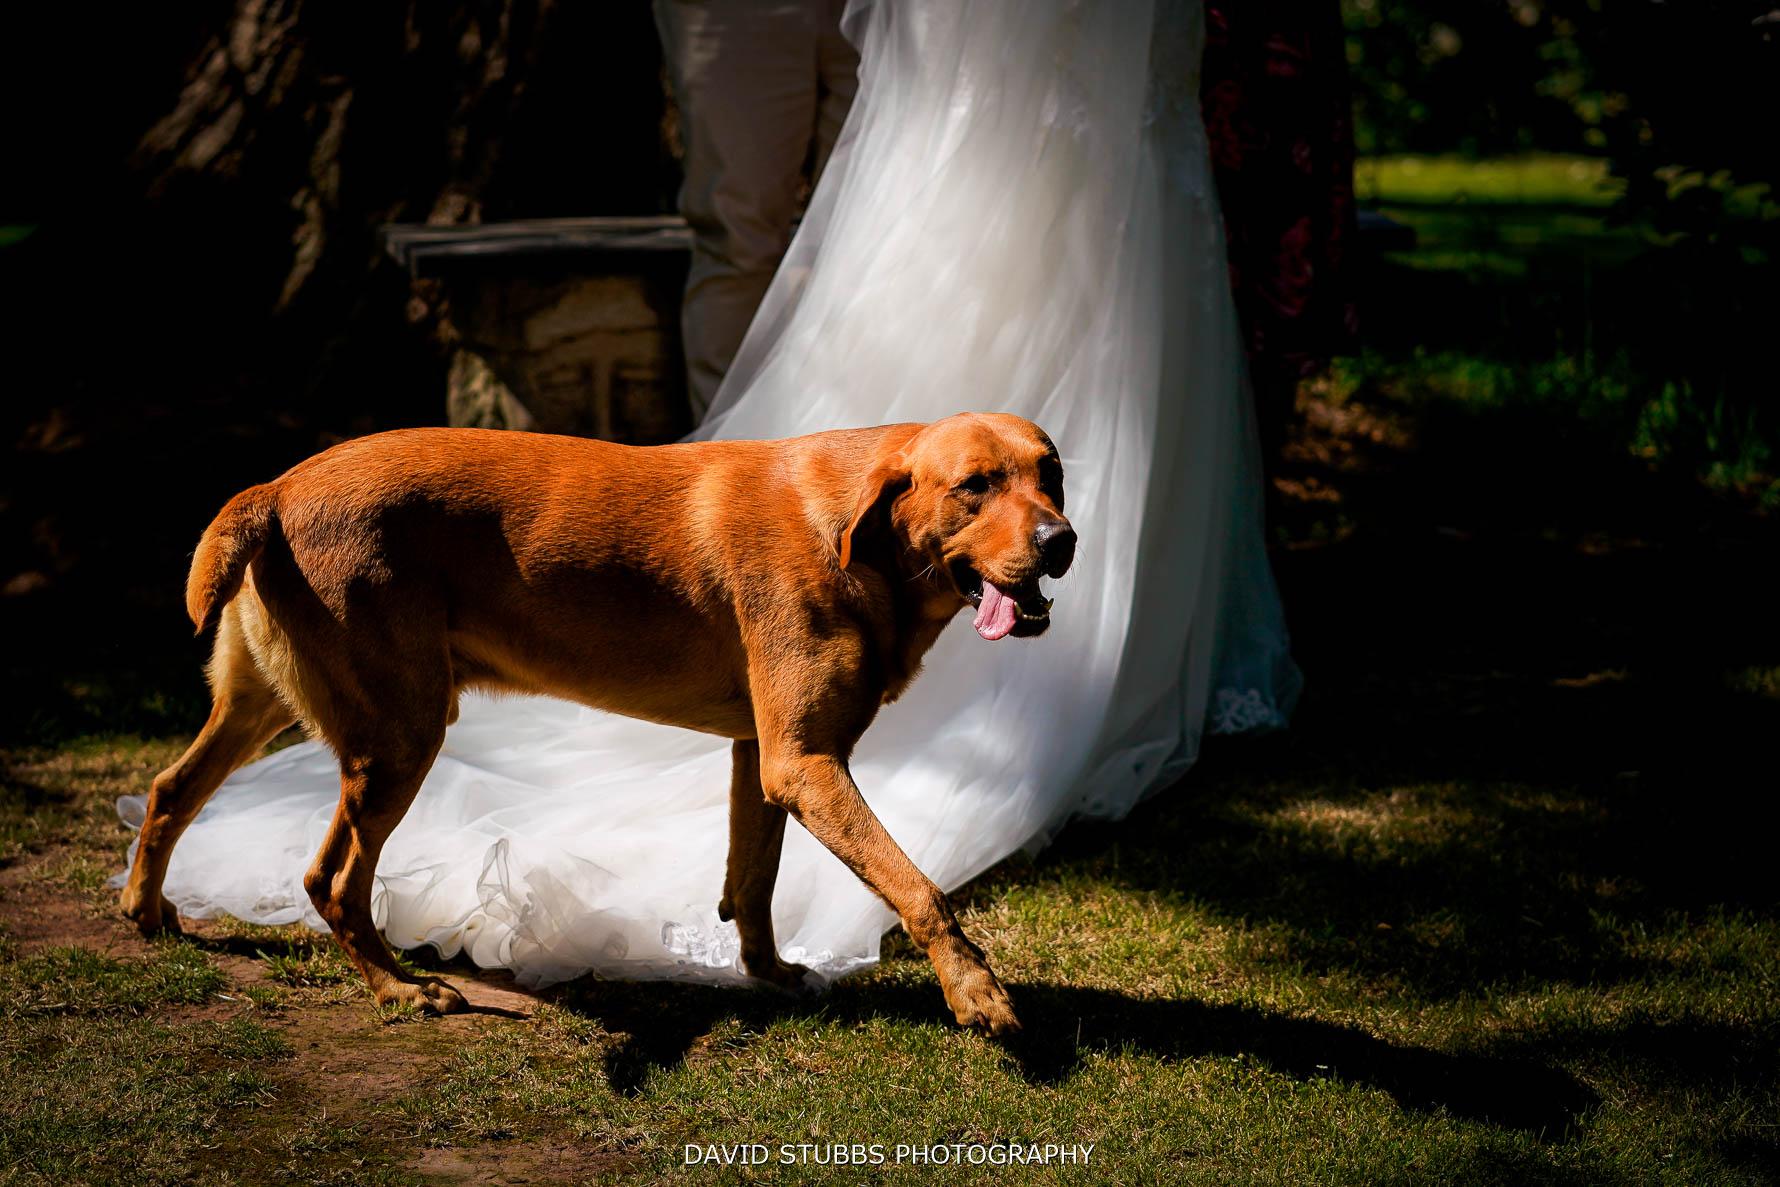 dog walking past the wedding dress